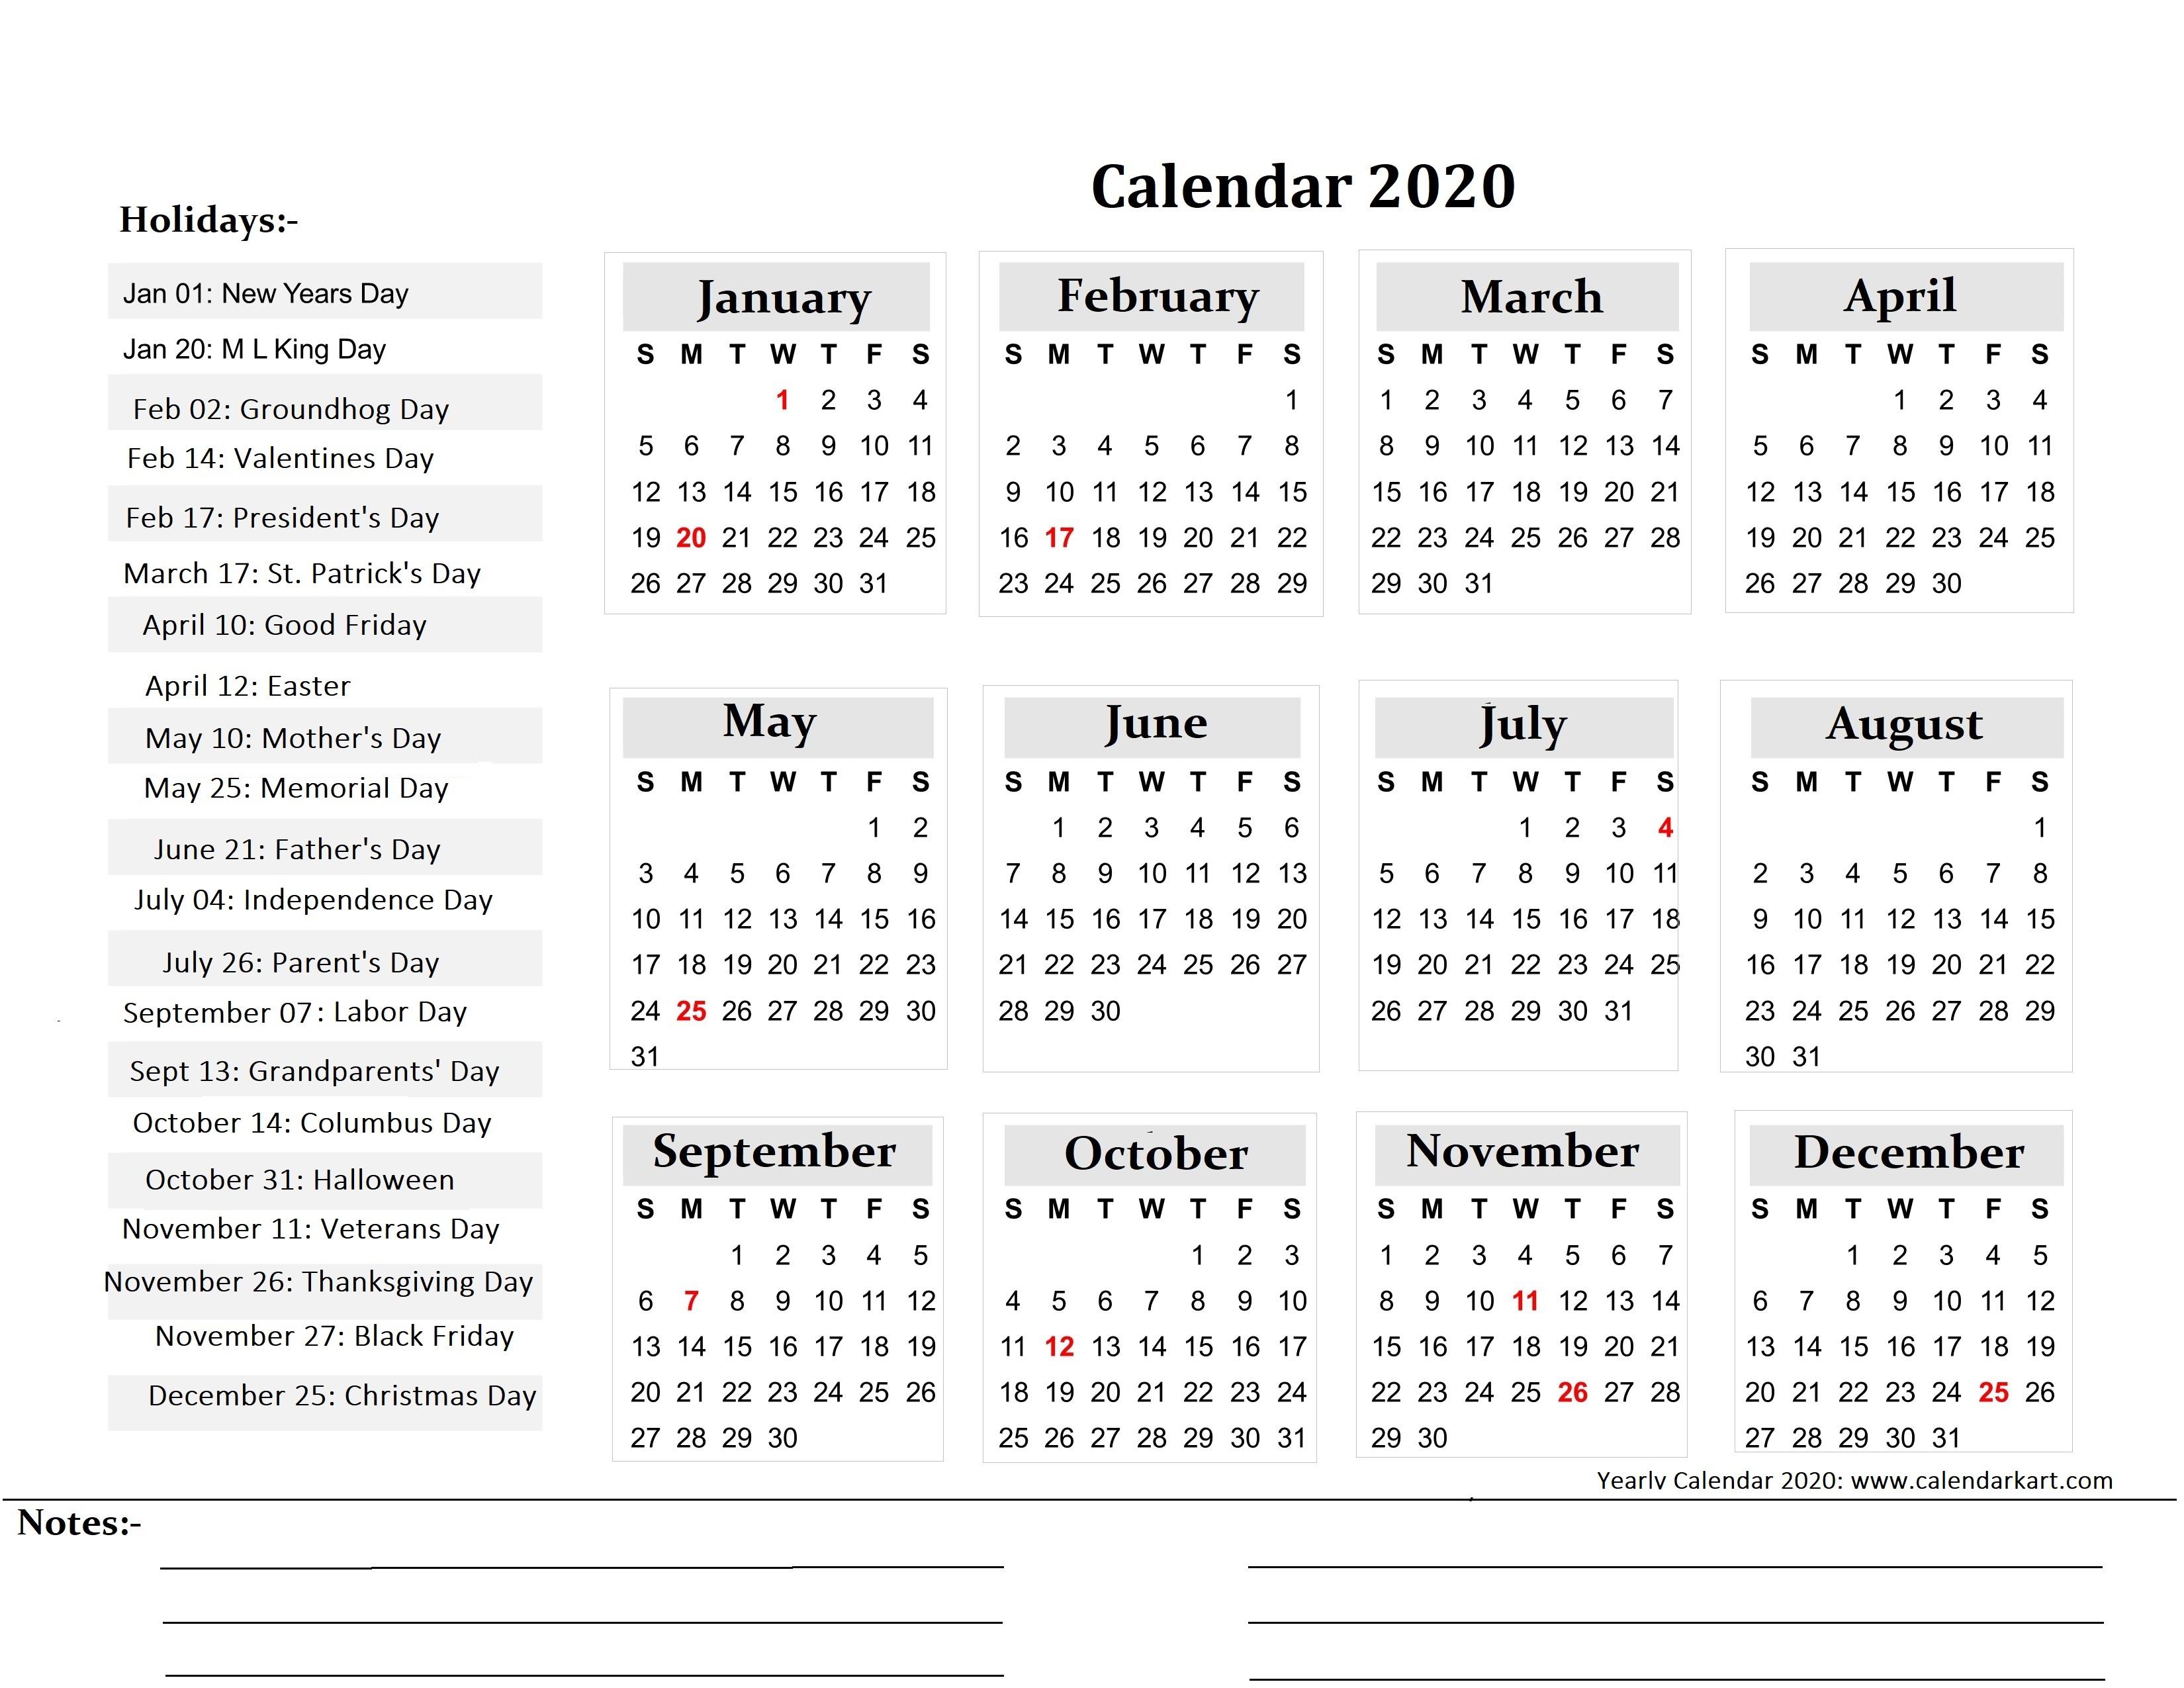 Printable Yearly Calendar 2020 - Calendar-Kart